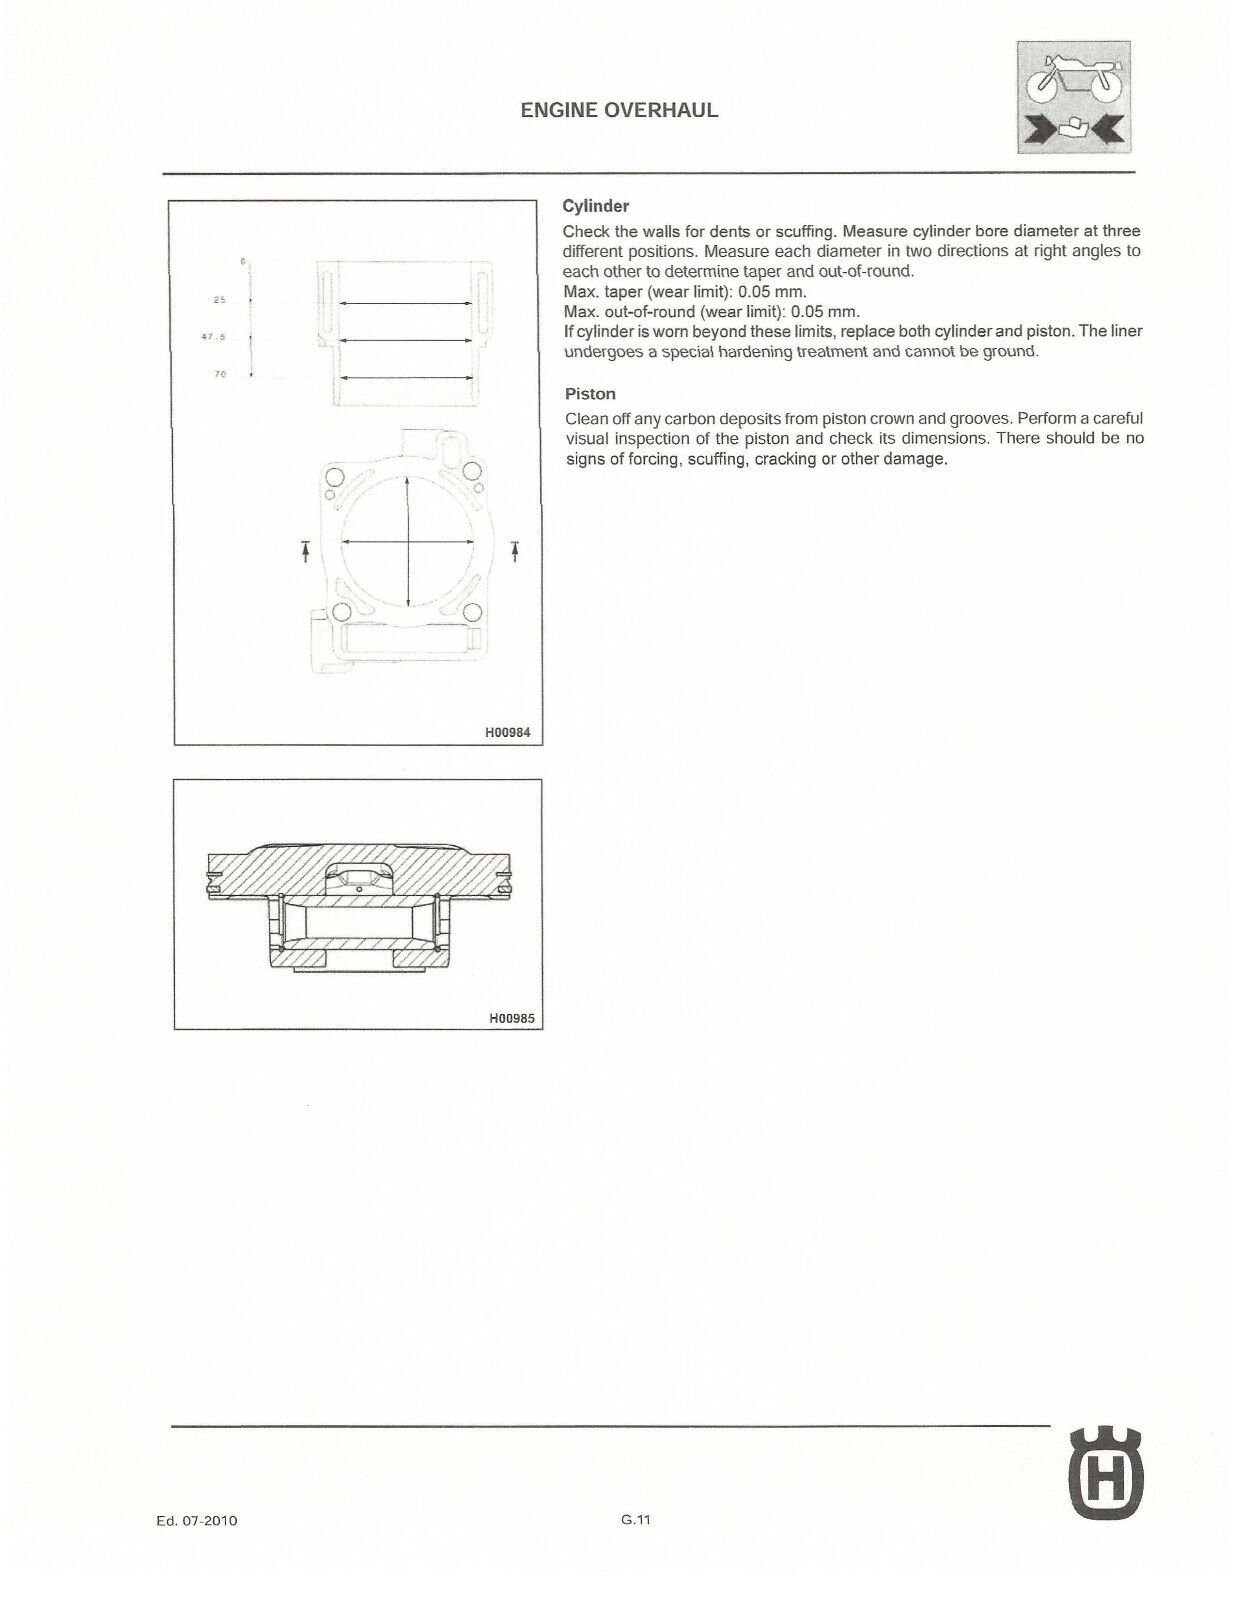 ... workshop service manual 2011 TC 250 11 of 12 Husqvarna ...